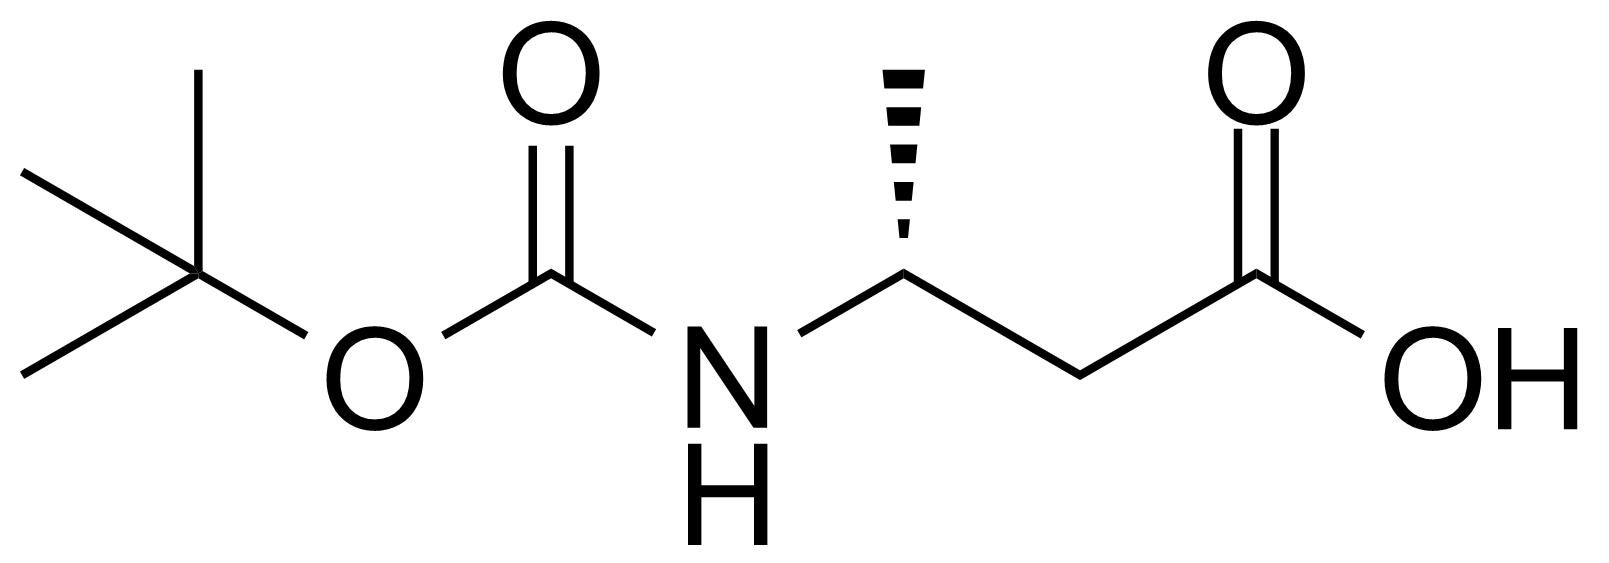 Structure of Boc-L-beta-Homoalanine